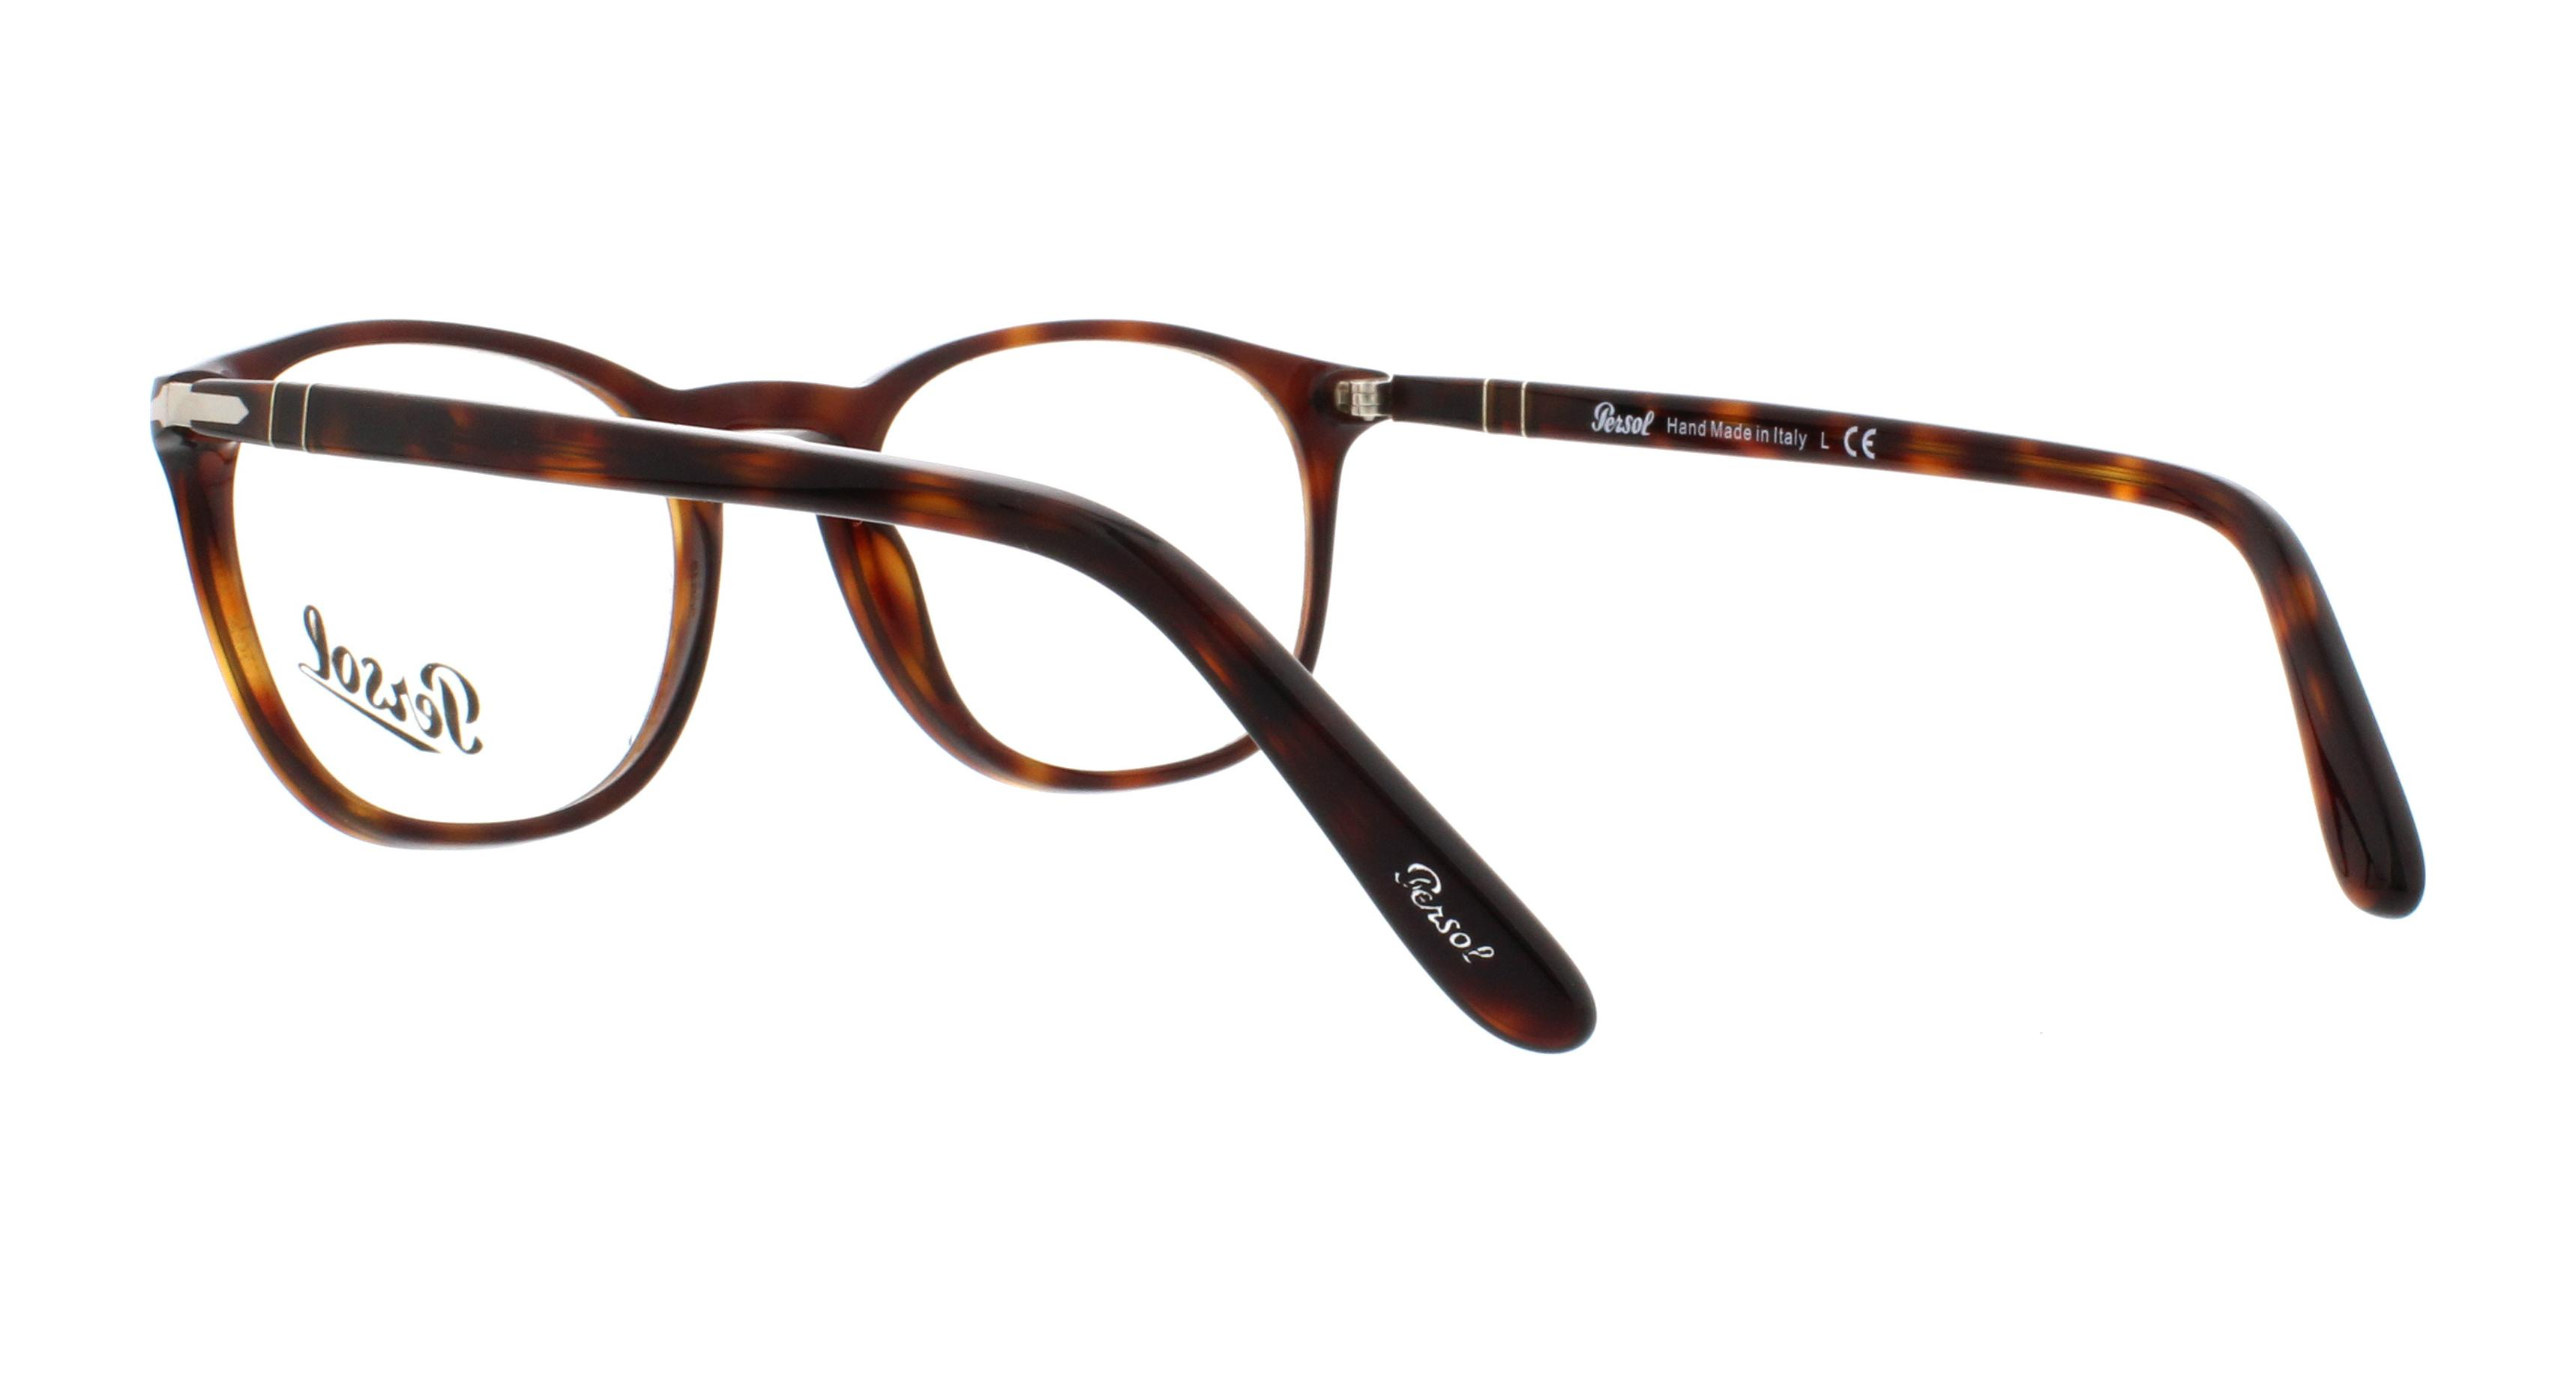 50d6251e9ef3 PERSOL Eyeglasses PO3007V 24 Havana 50MM - Walmart.com